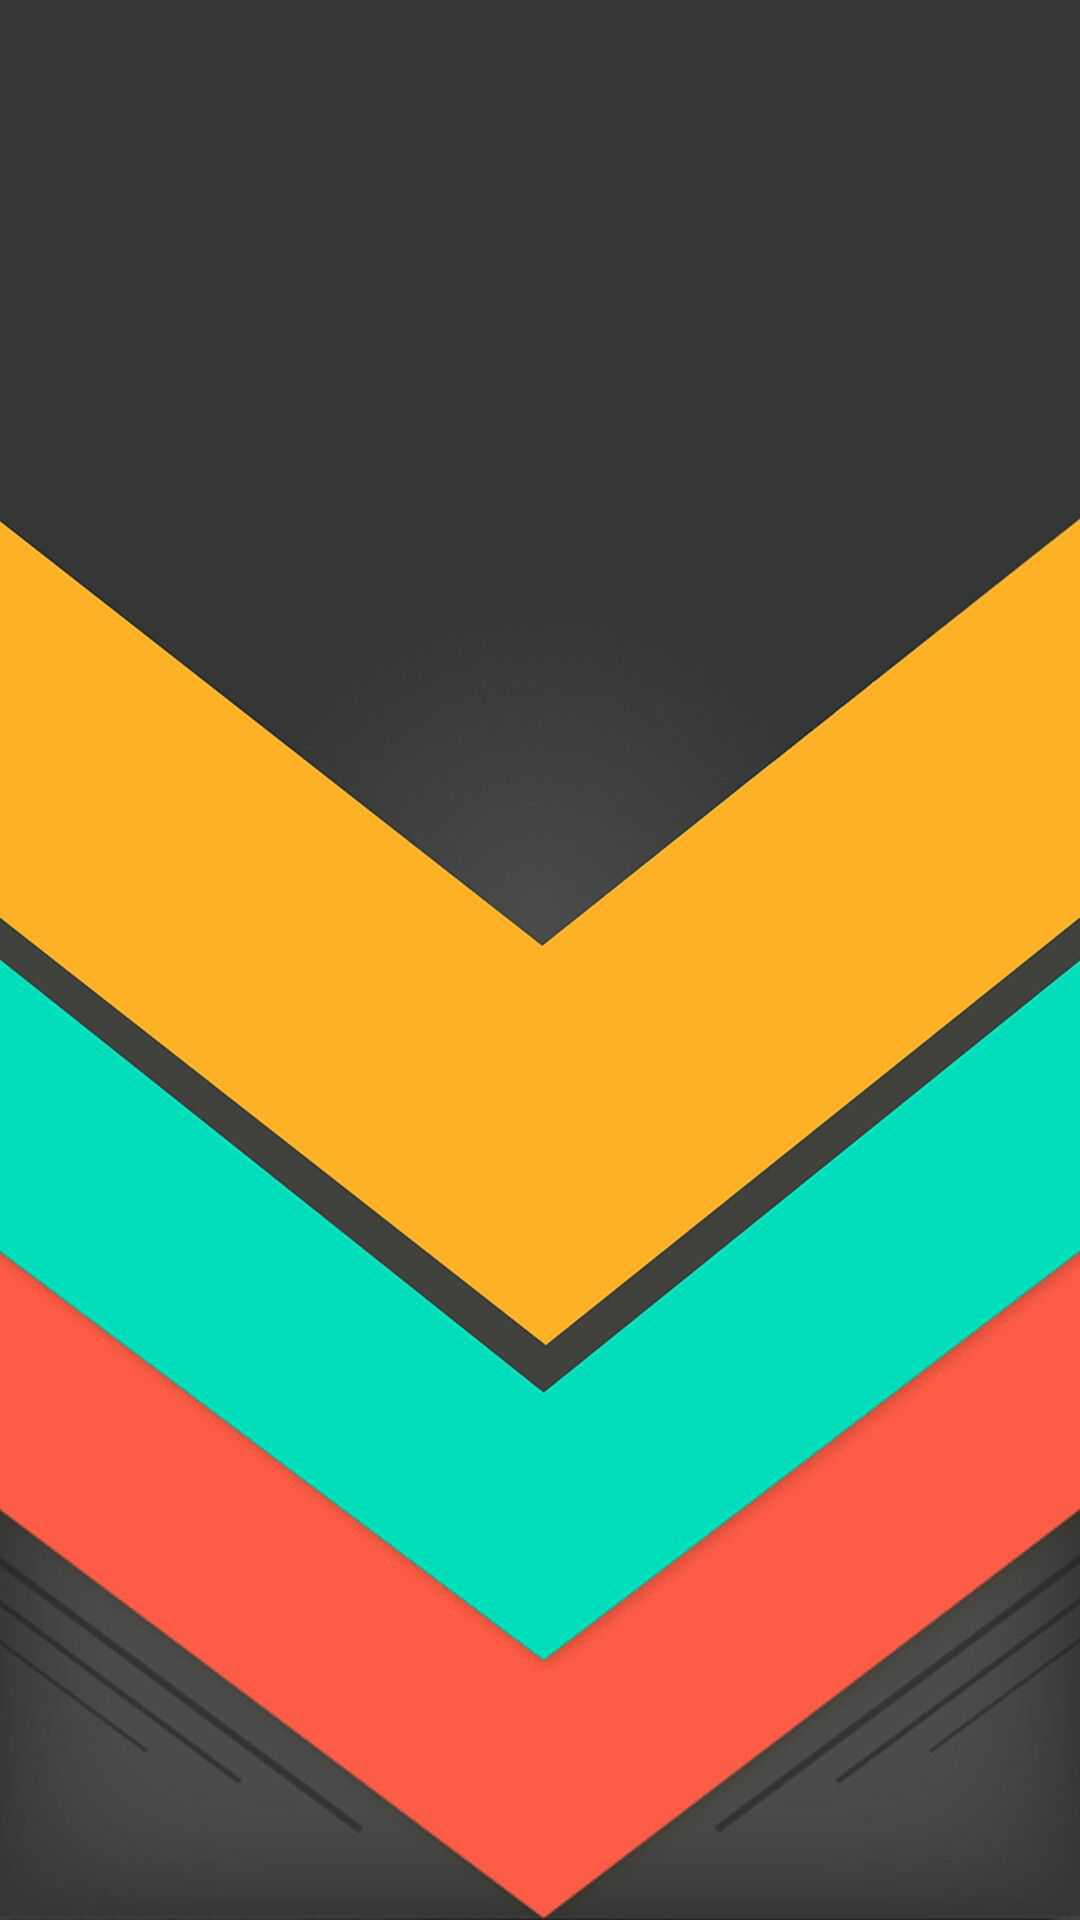 Minimal Design Lines iPhone Wallpaper